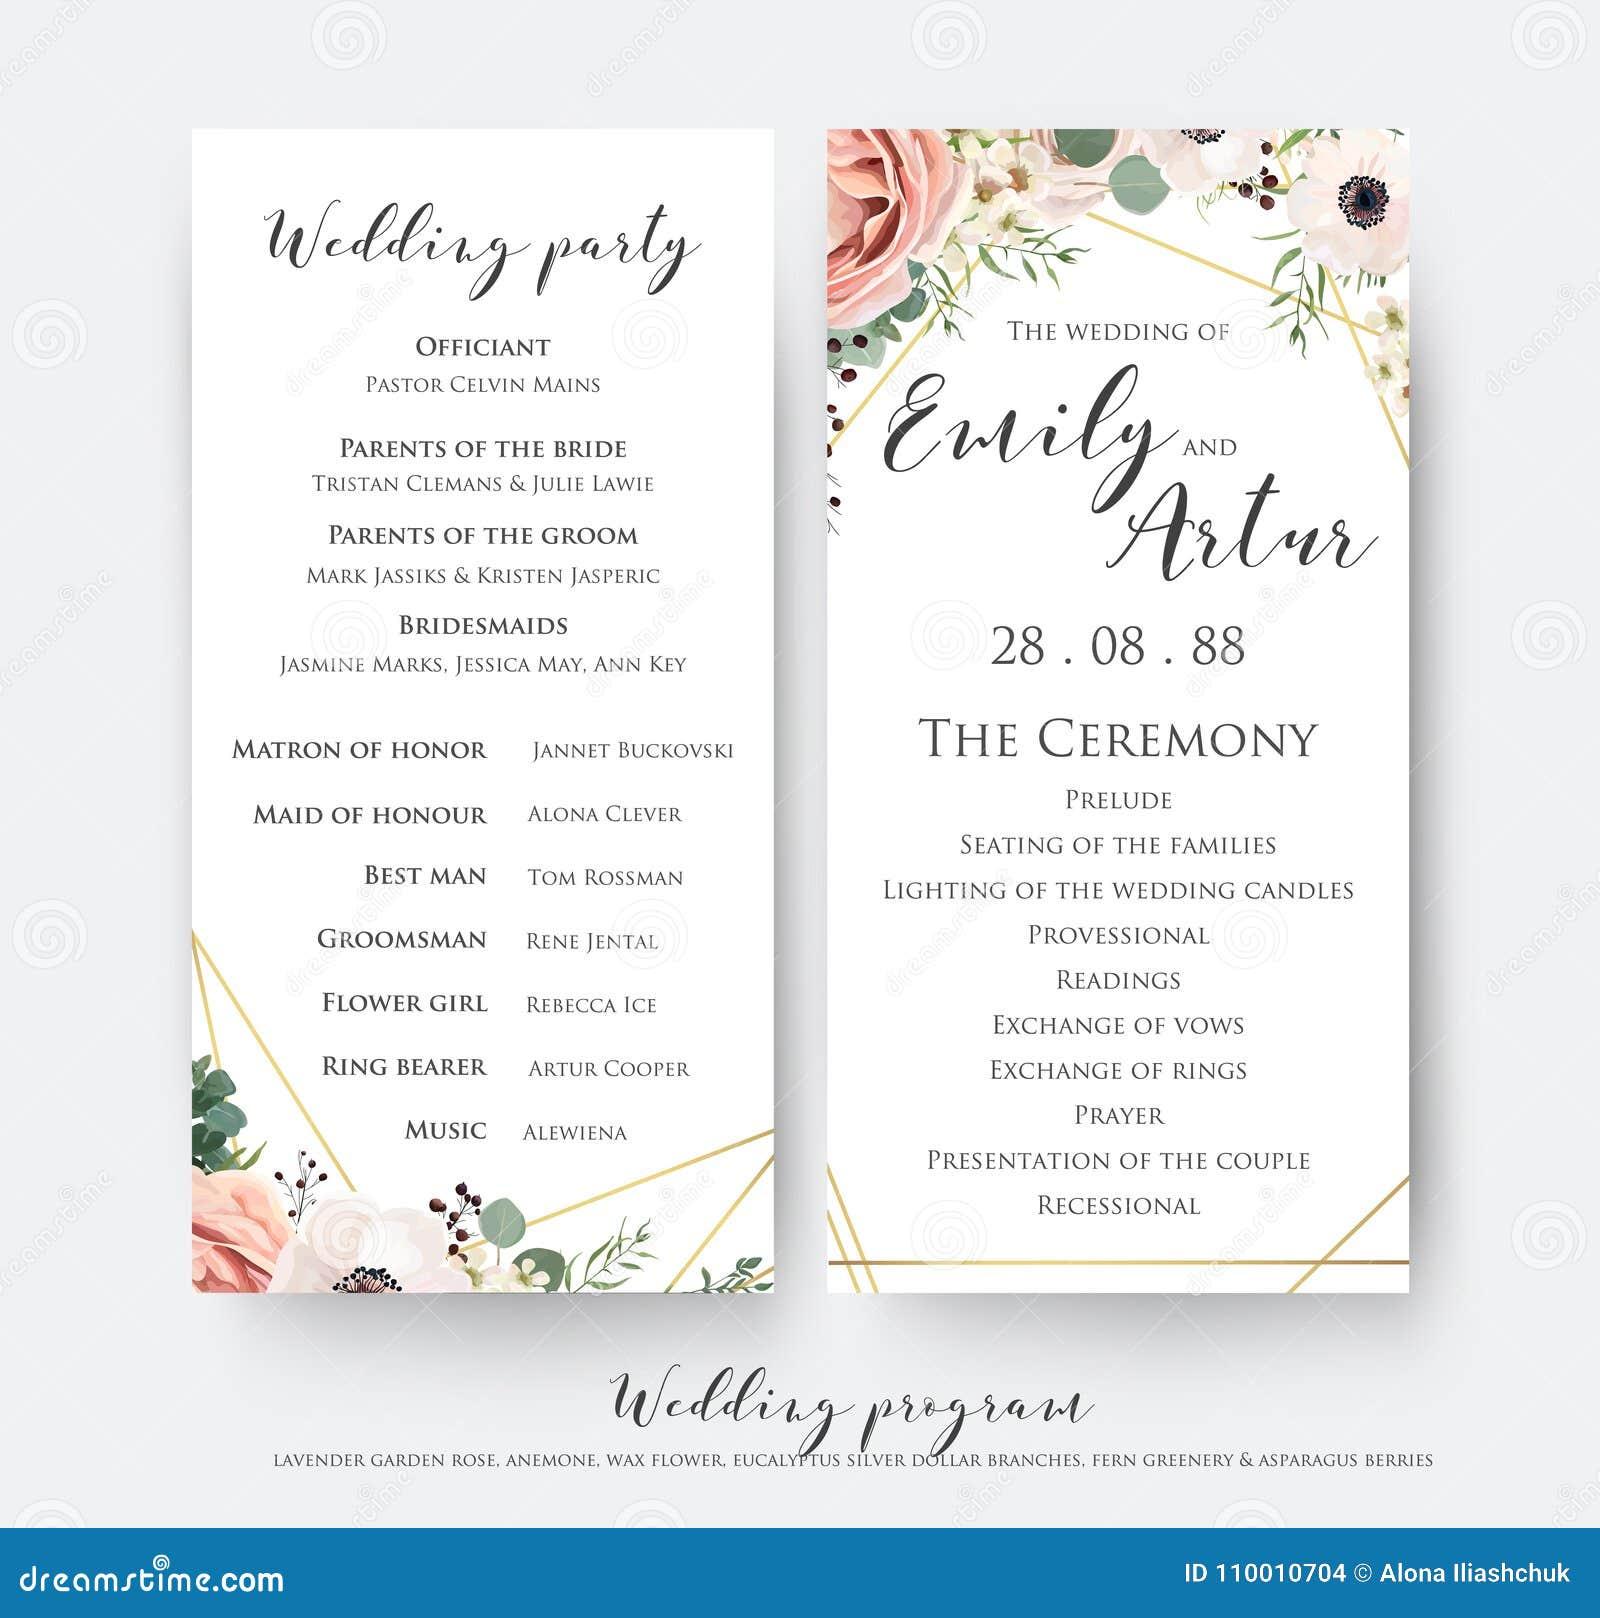 Wedding Program For Party Ceremony Card Design With Elegant La